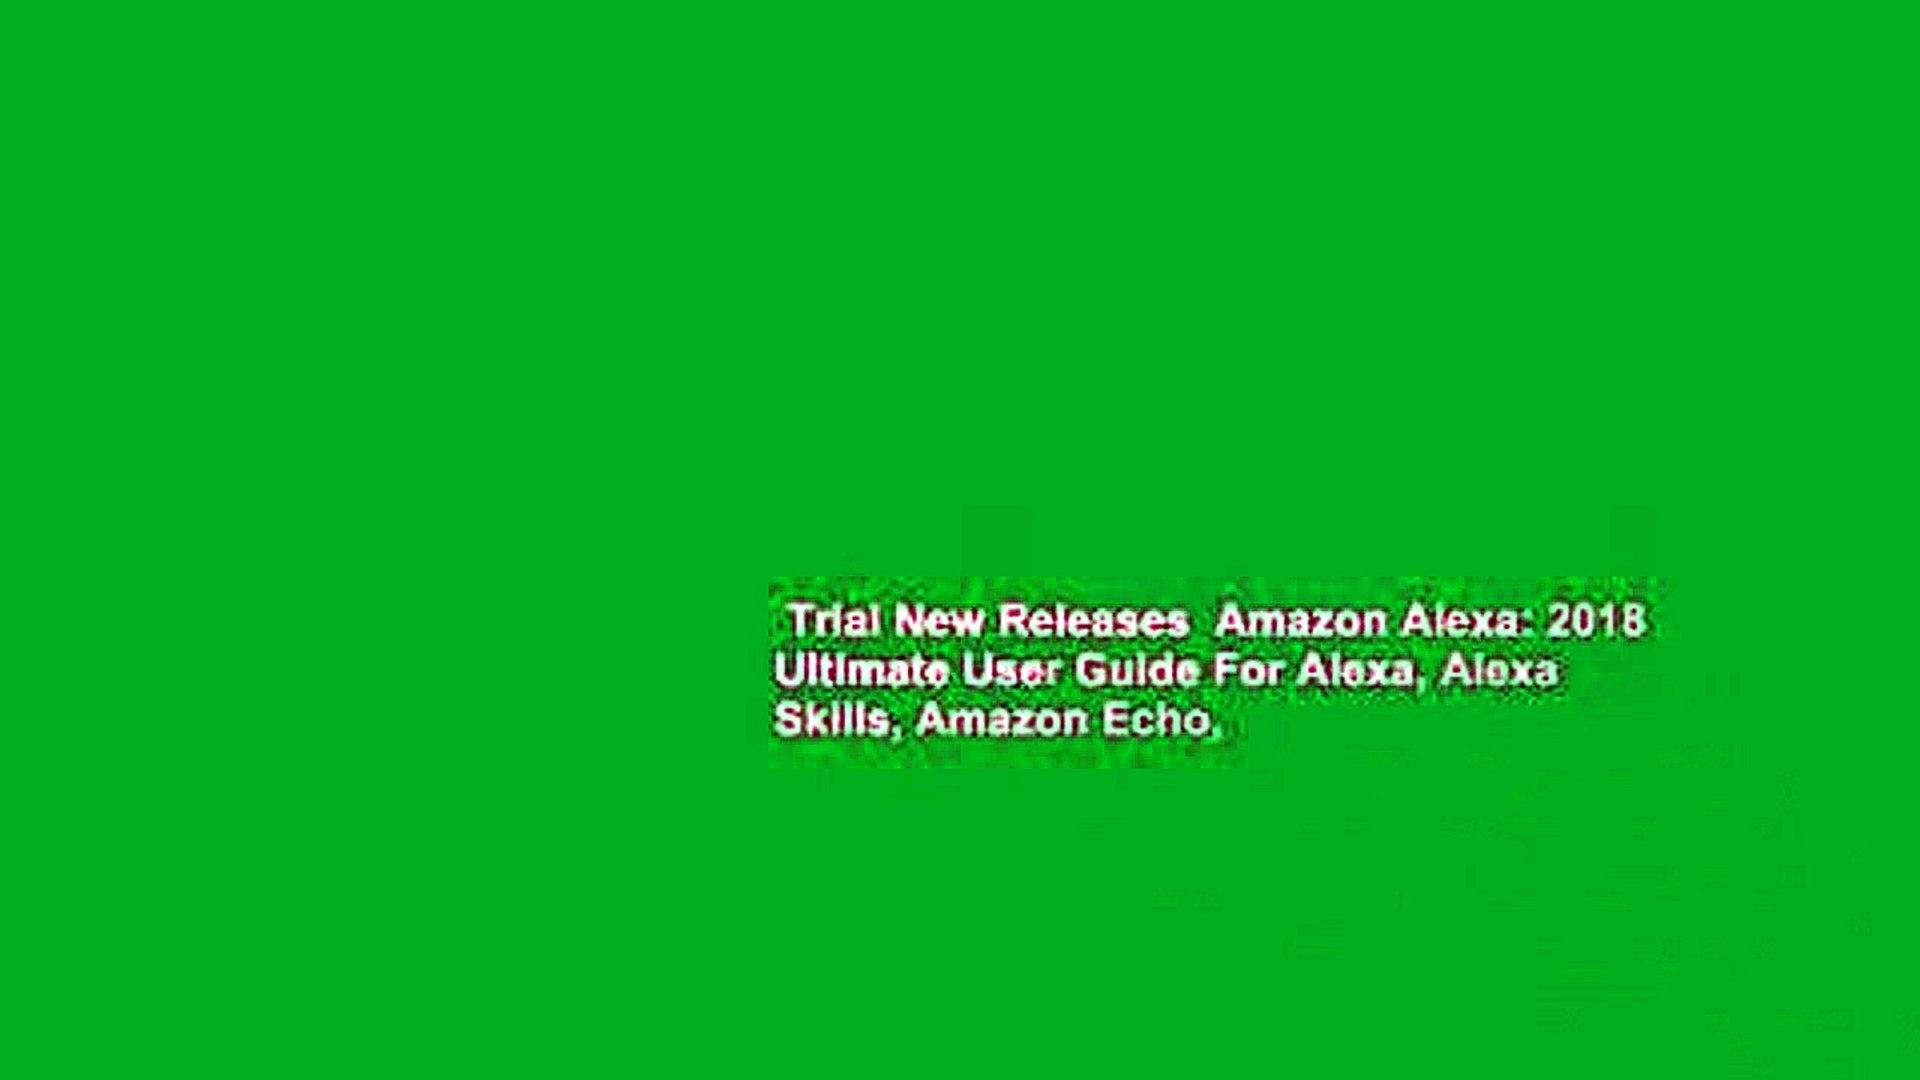 Trial New Releases  Amazon Alexa: 2018 Ultimate User Guide For Alexa, Alexa Skills, Amazon Echo,